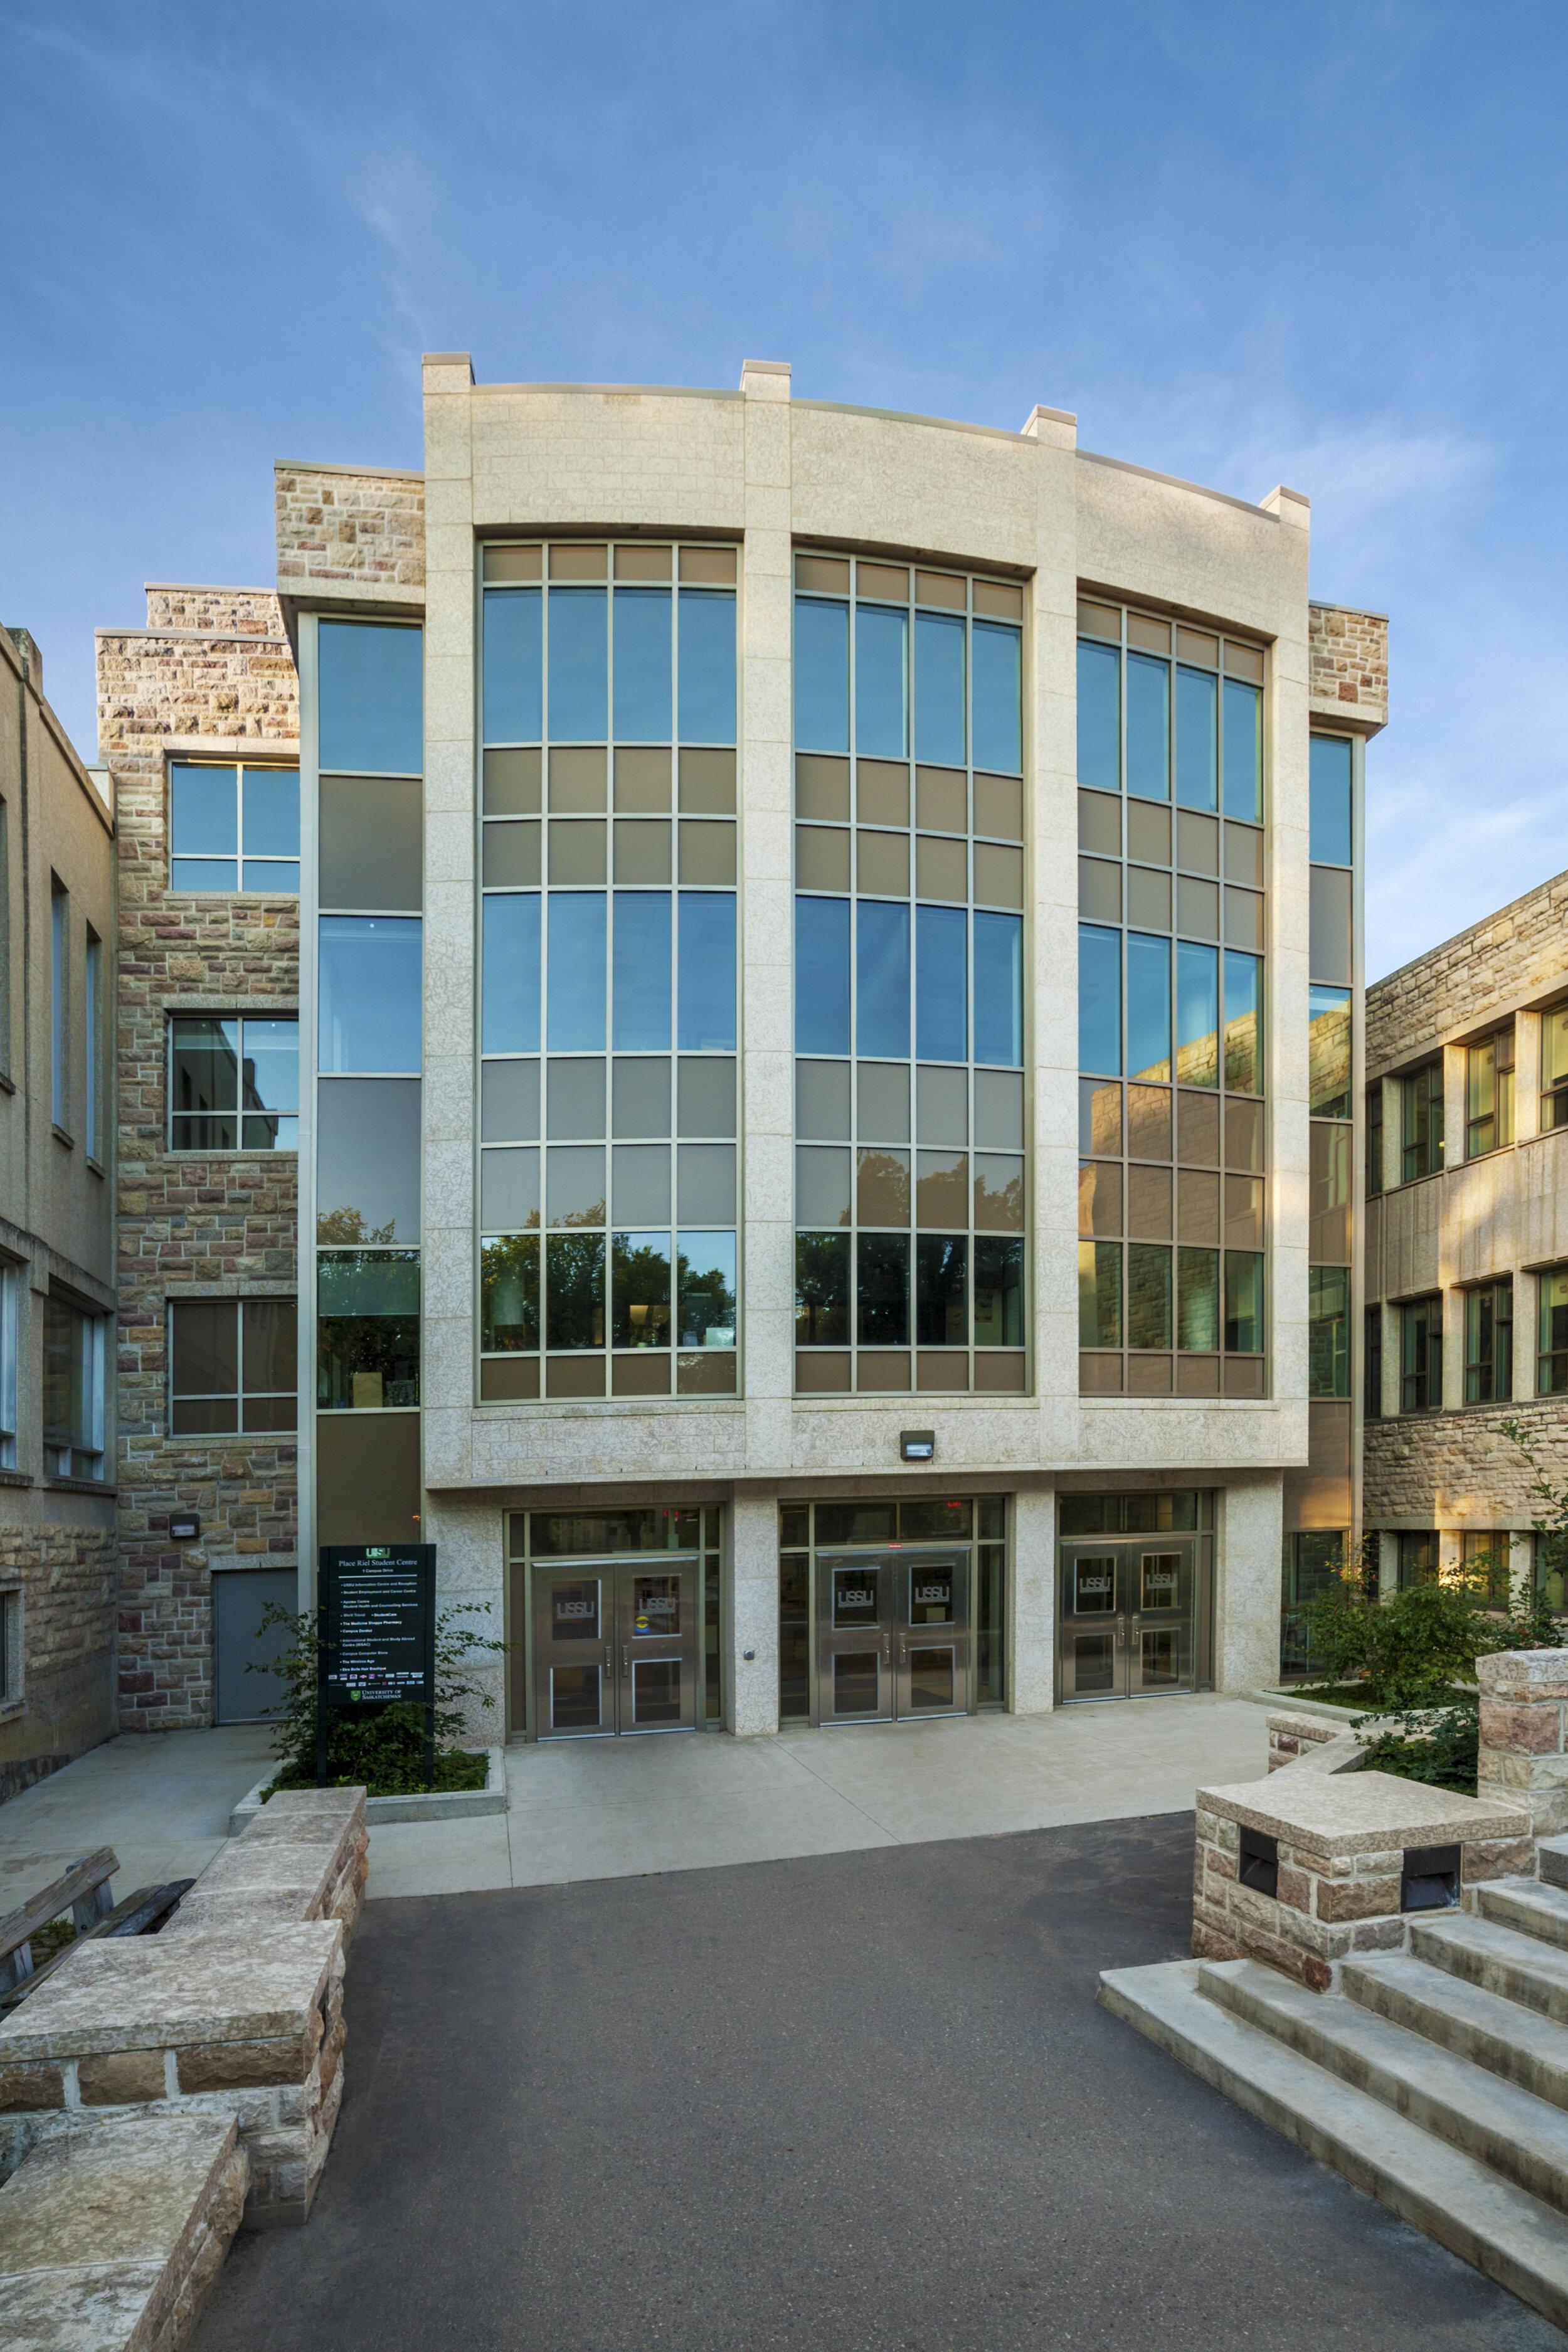 University of Saskatchewan - Place Riel - Saskatoon, SK